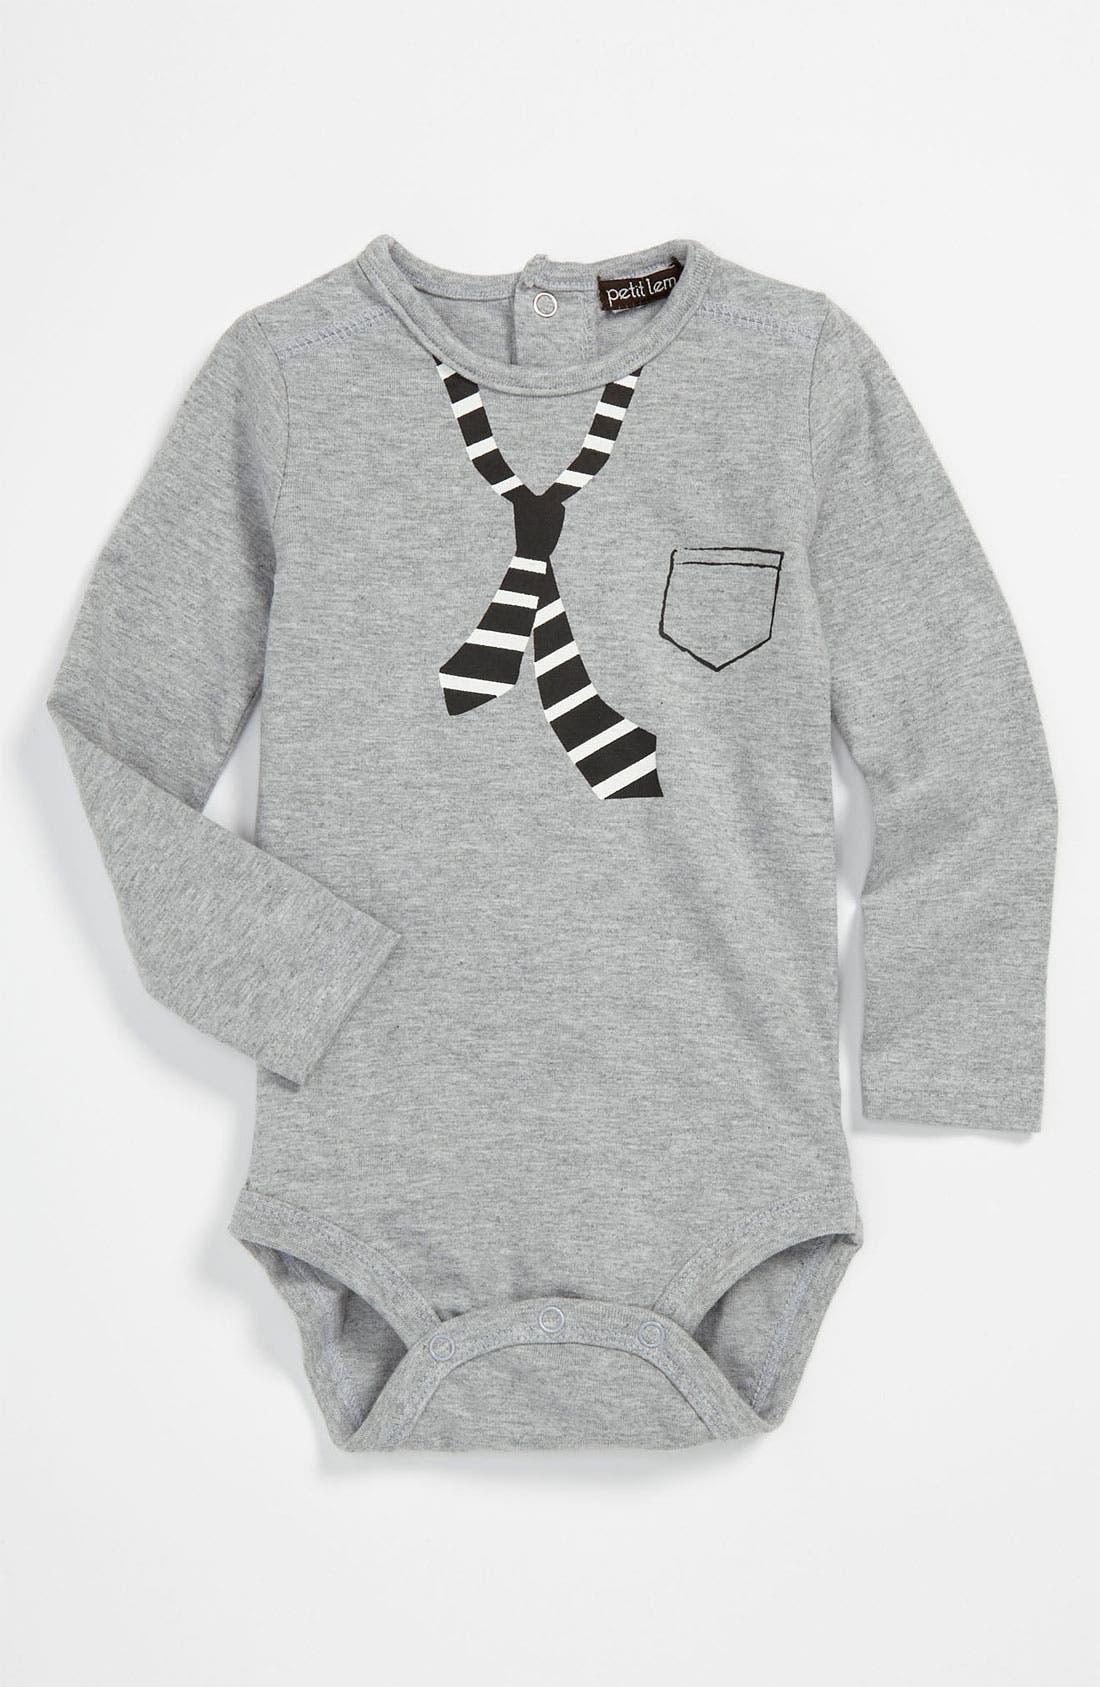 Alternate Image 1 Selected - Petit Lem Bodysuit (Infant)